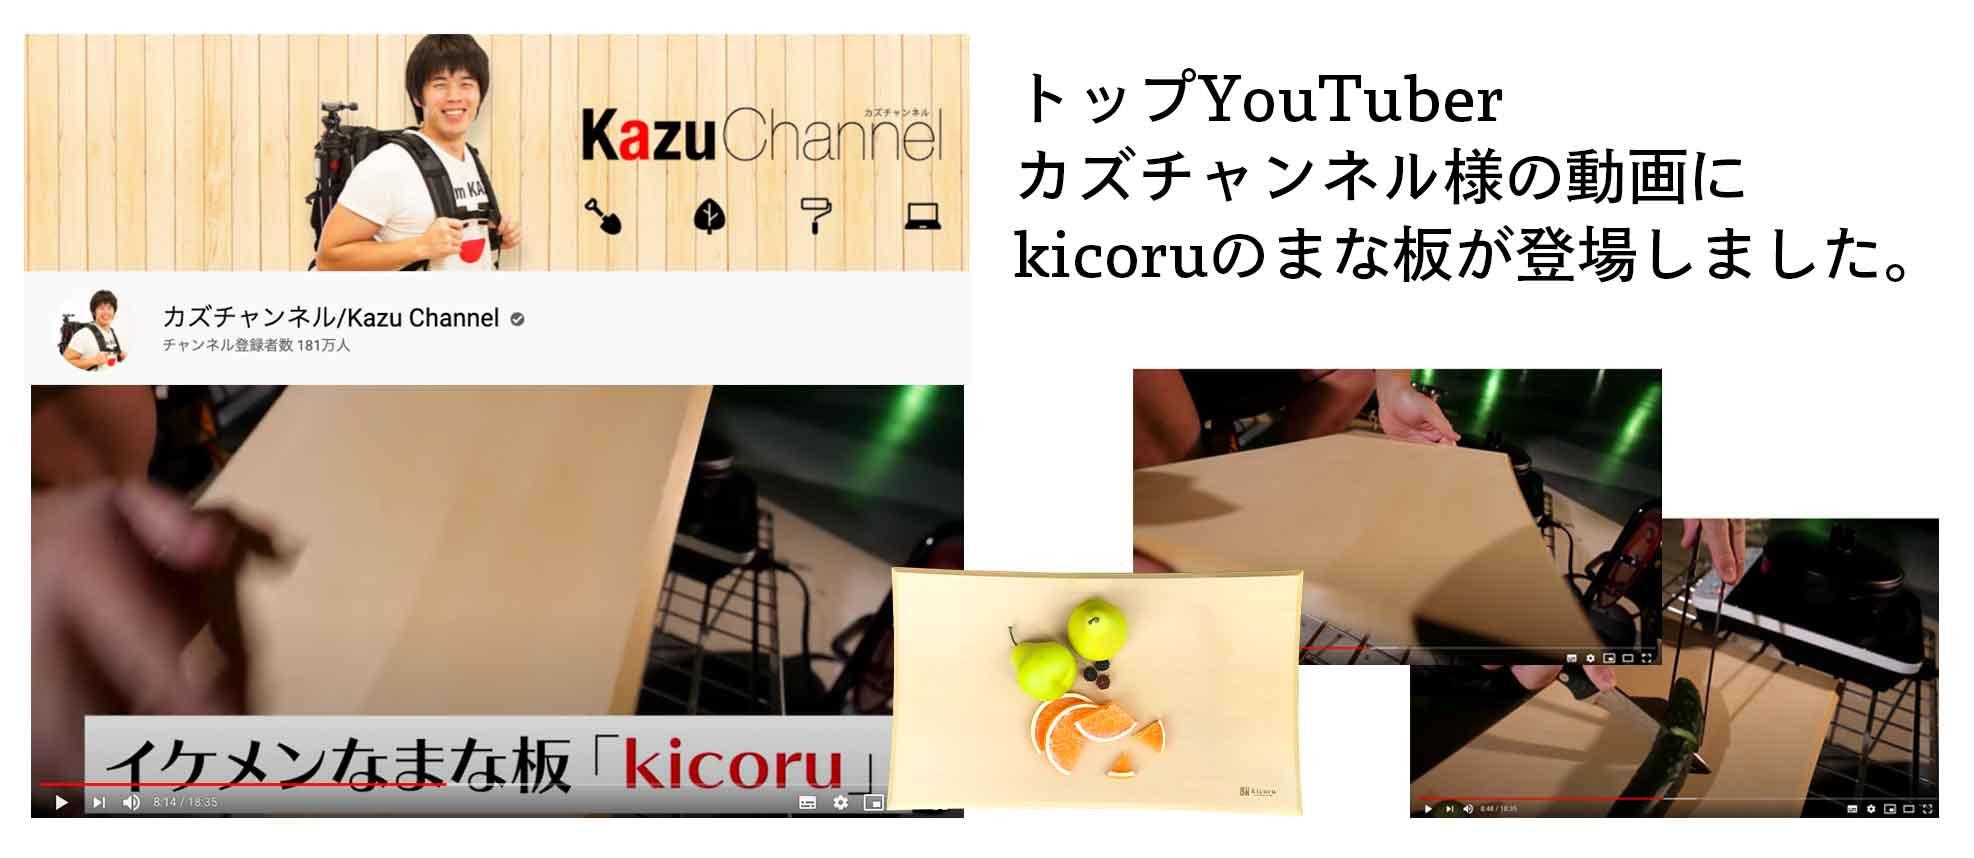 kicoruのまな板がカズチャンネルにて紹介されました